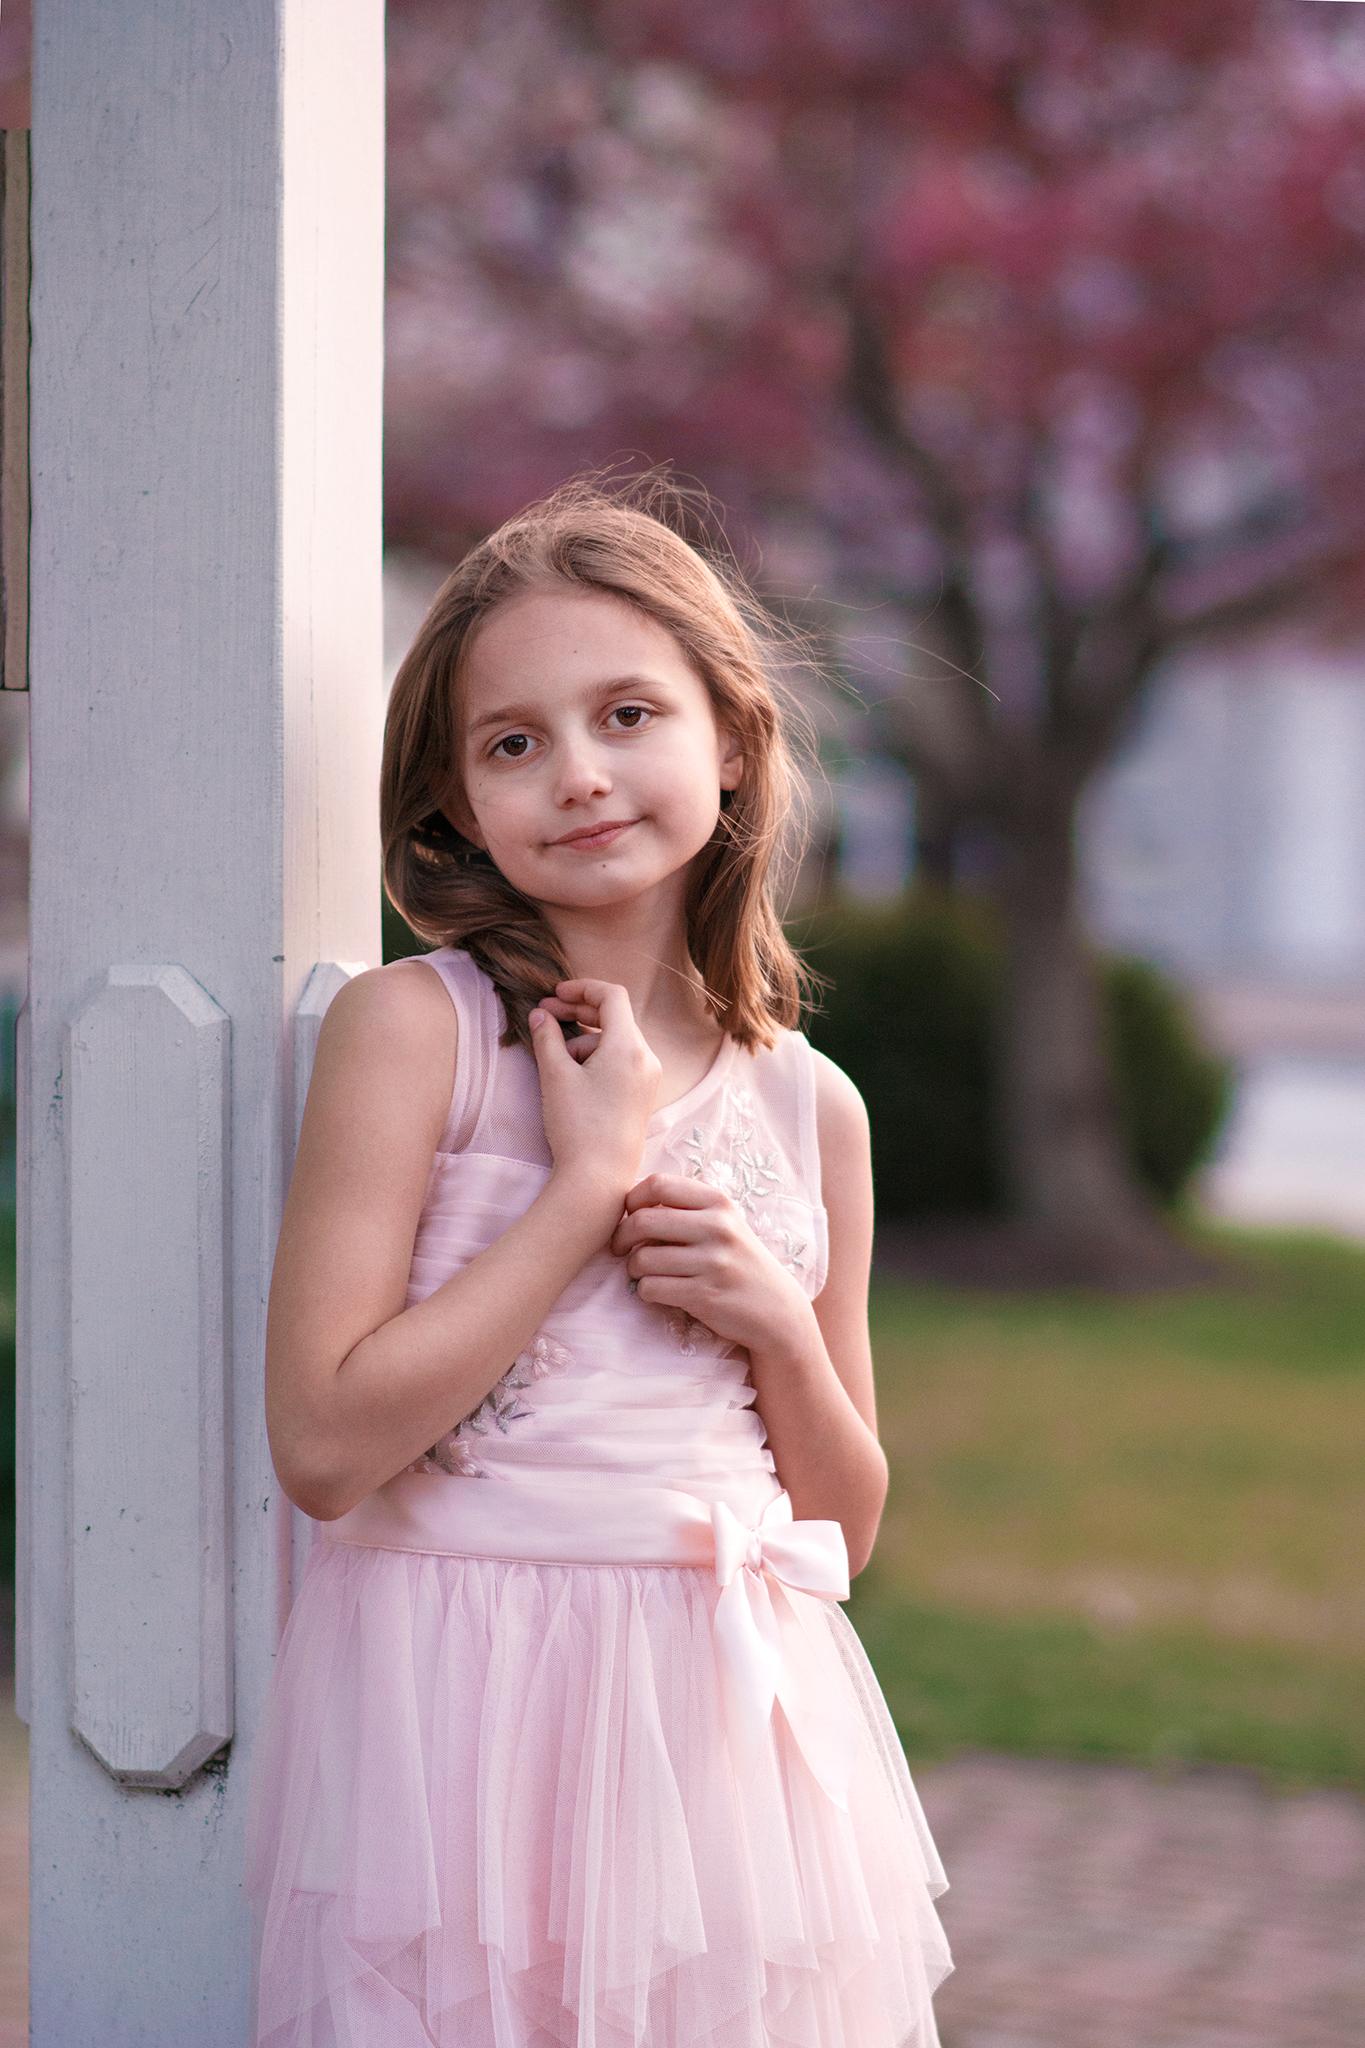 girl in pink dress.jpg